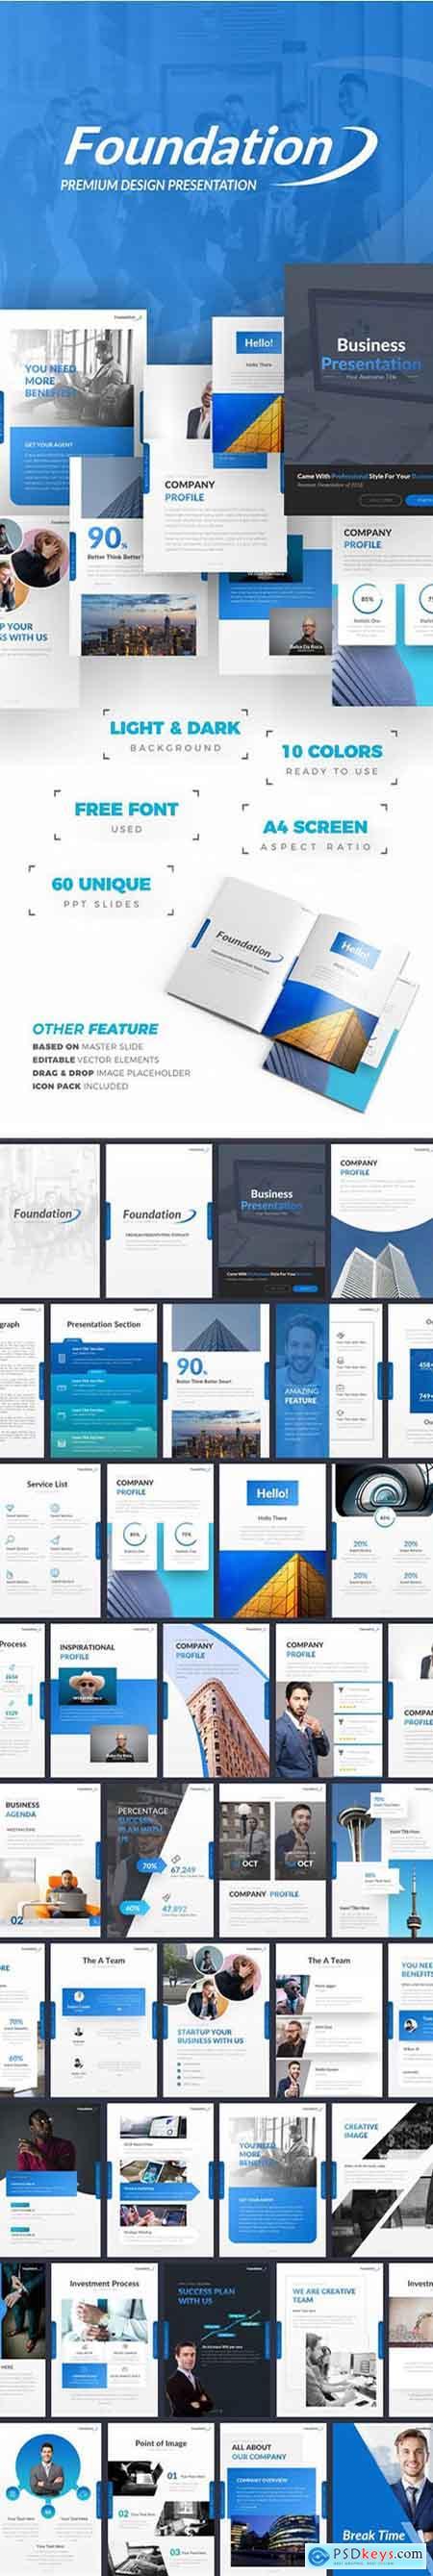 Graphicriver Foundation Portrait Presentation Template » Free